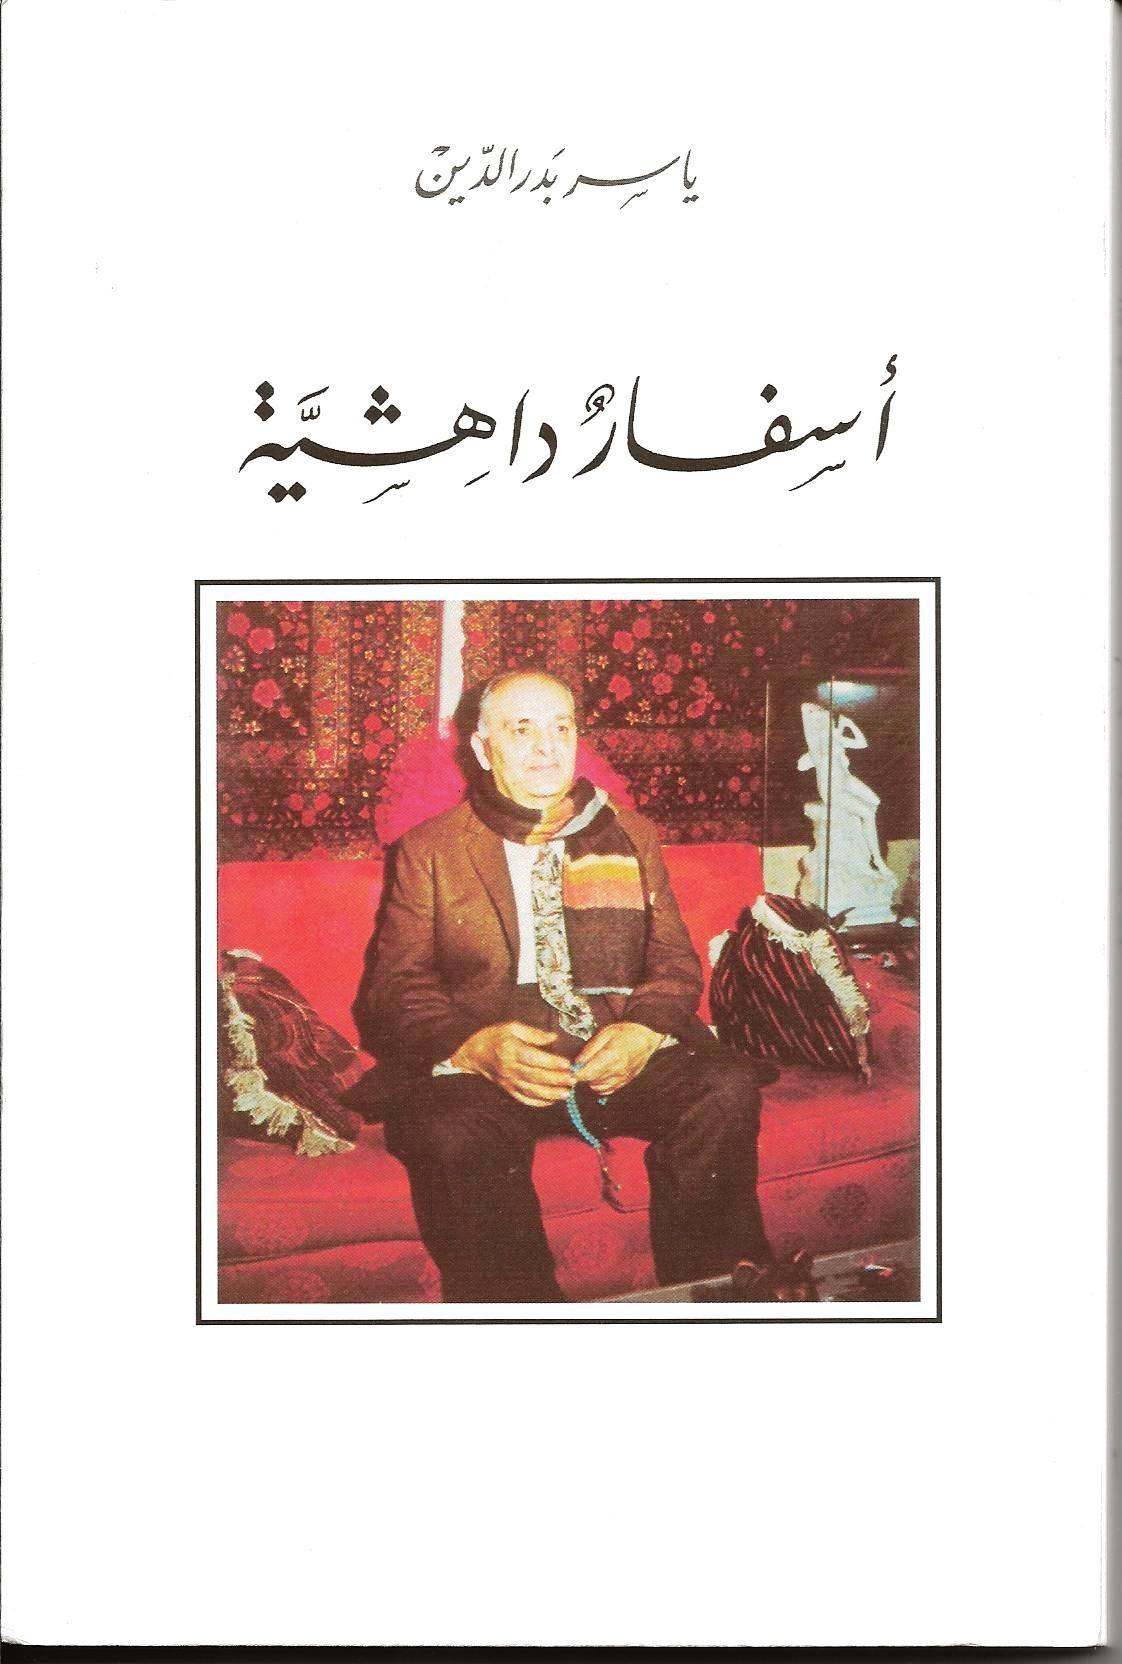 Asfar Dahishiyyah